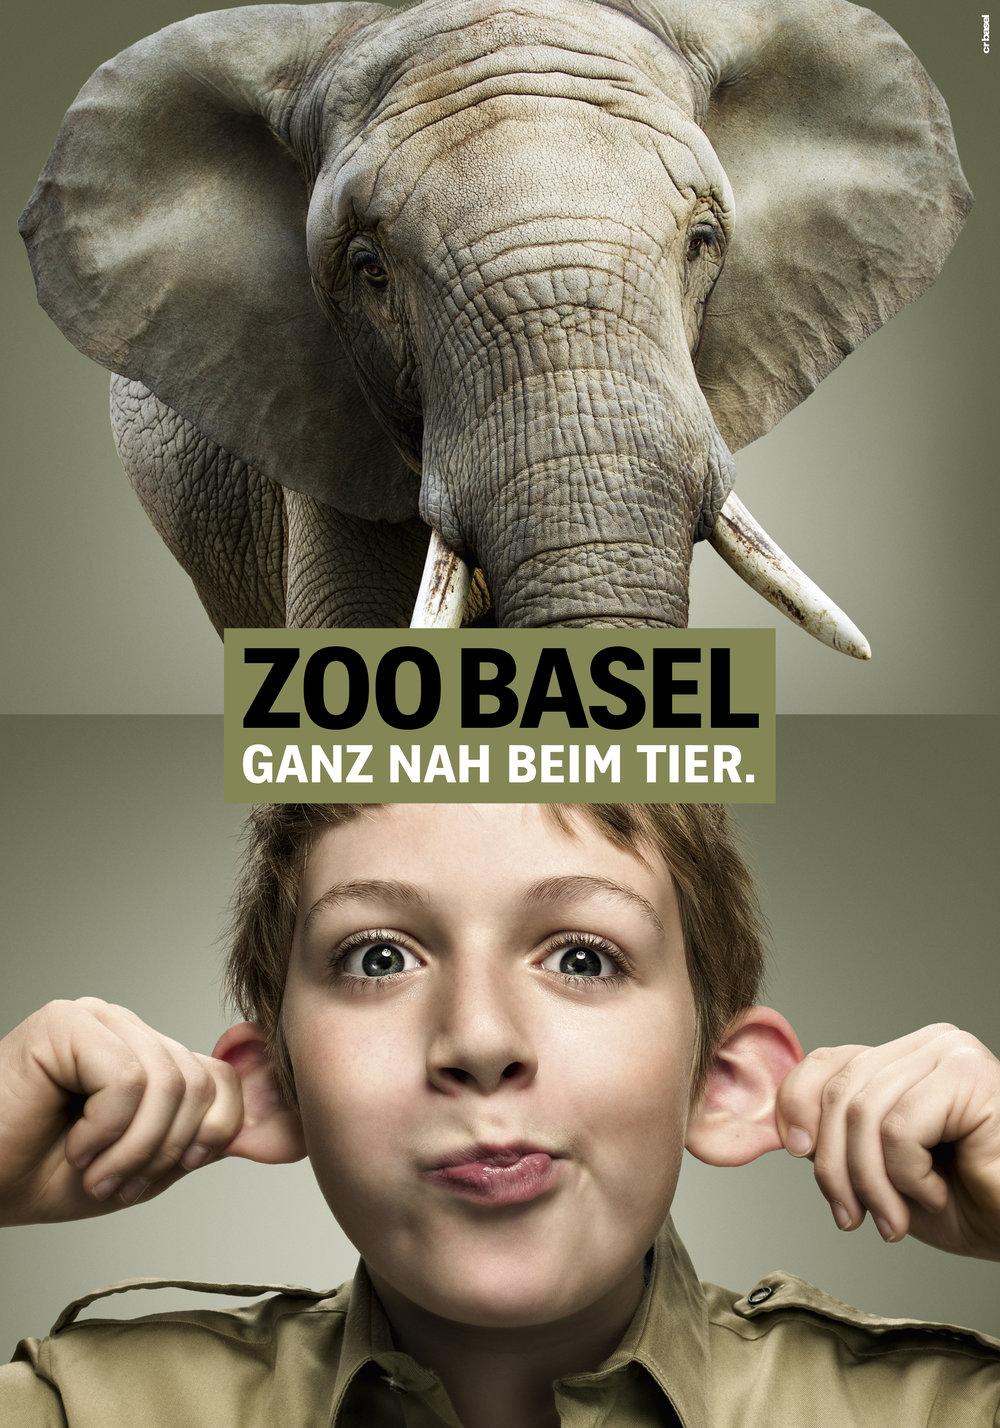 fs_arbeit_12_zooganznah_11_elefant.jpeg